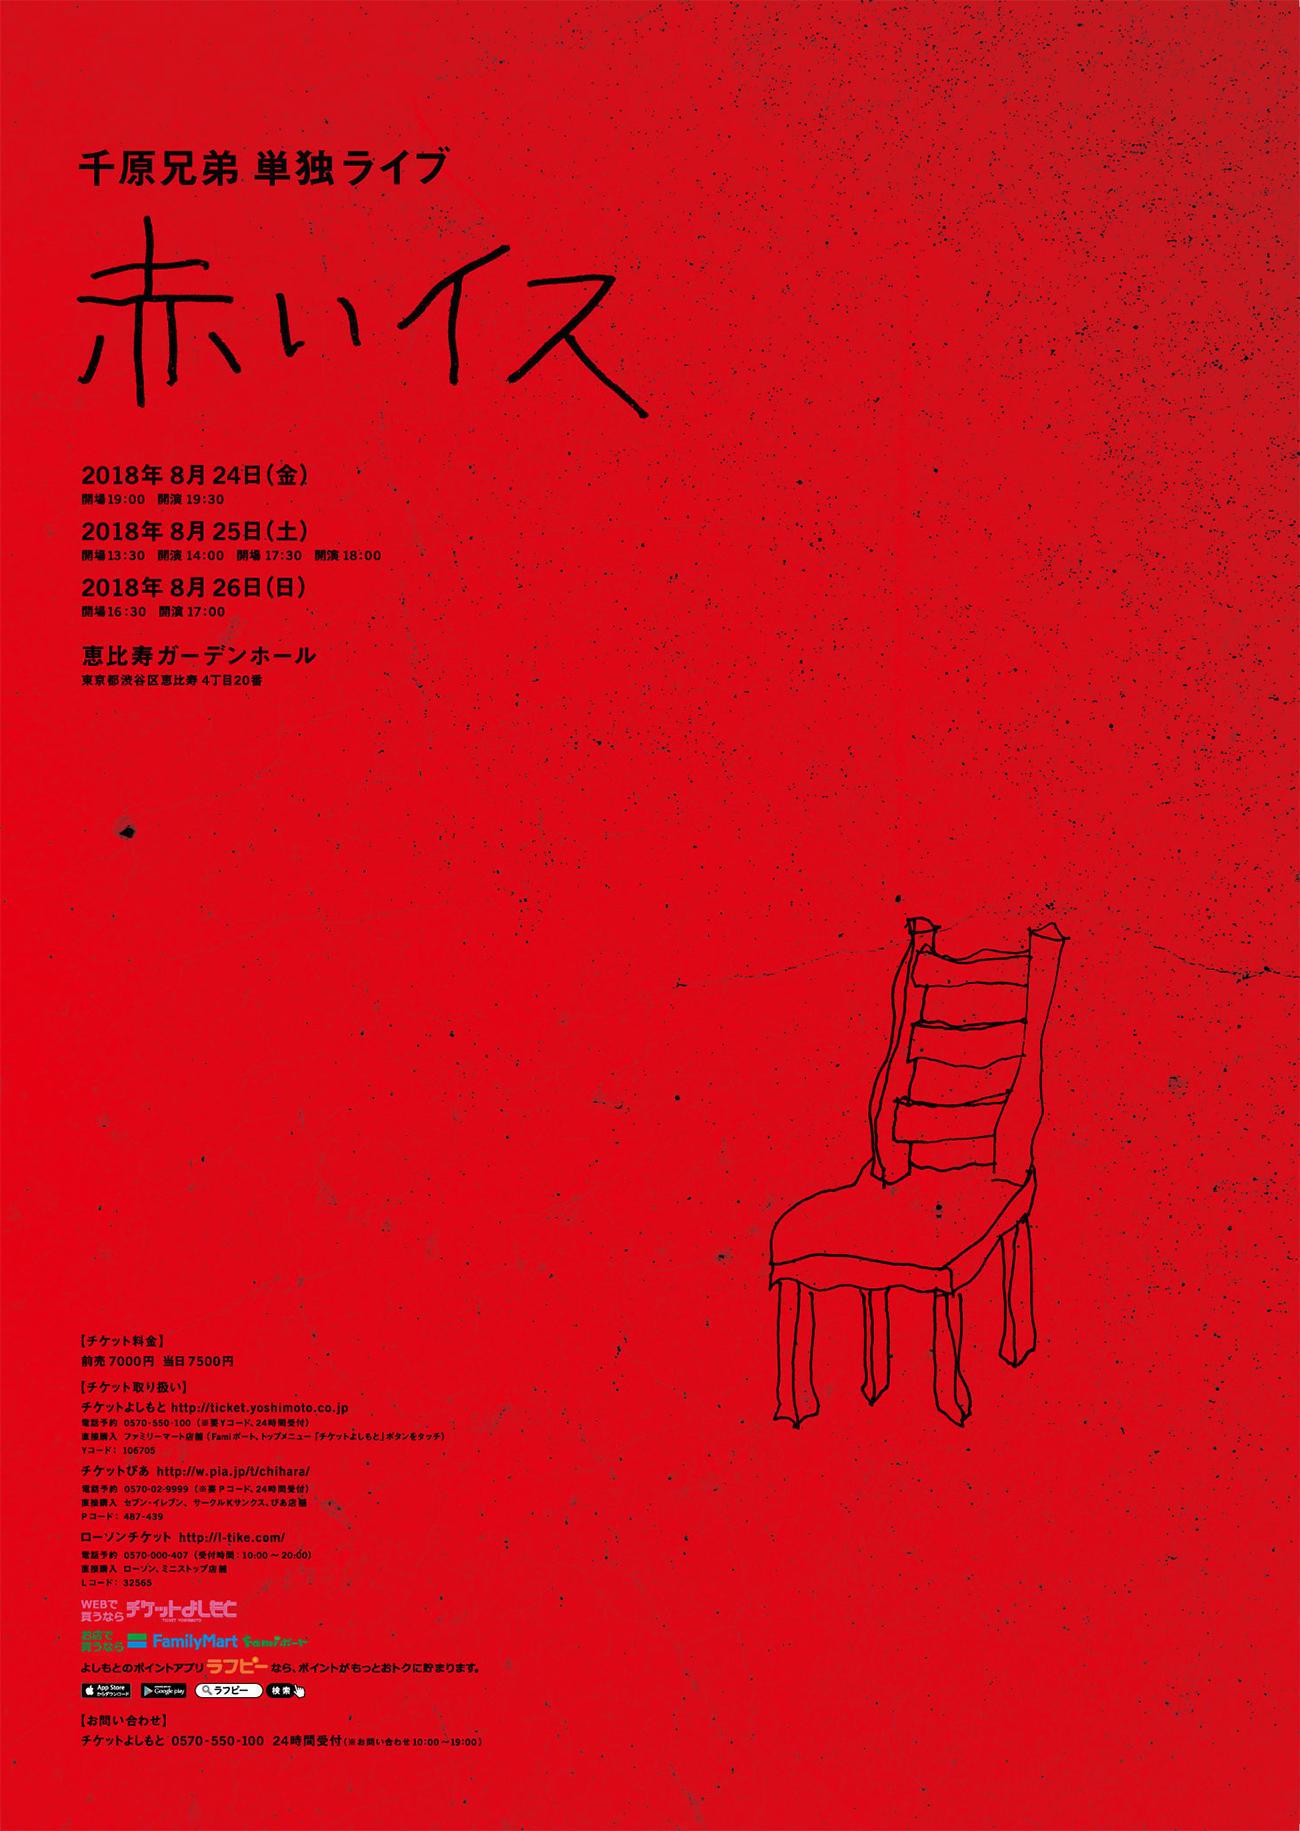 http://news.yoshimoto.co.jp/20180530172443-11a50bf407af60a723df65ca7126d13465d31530.jpg